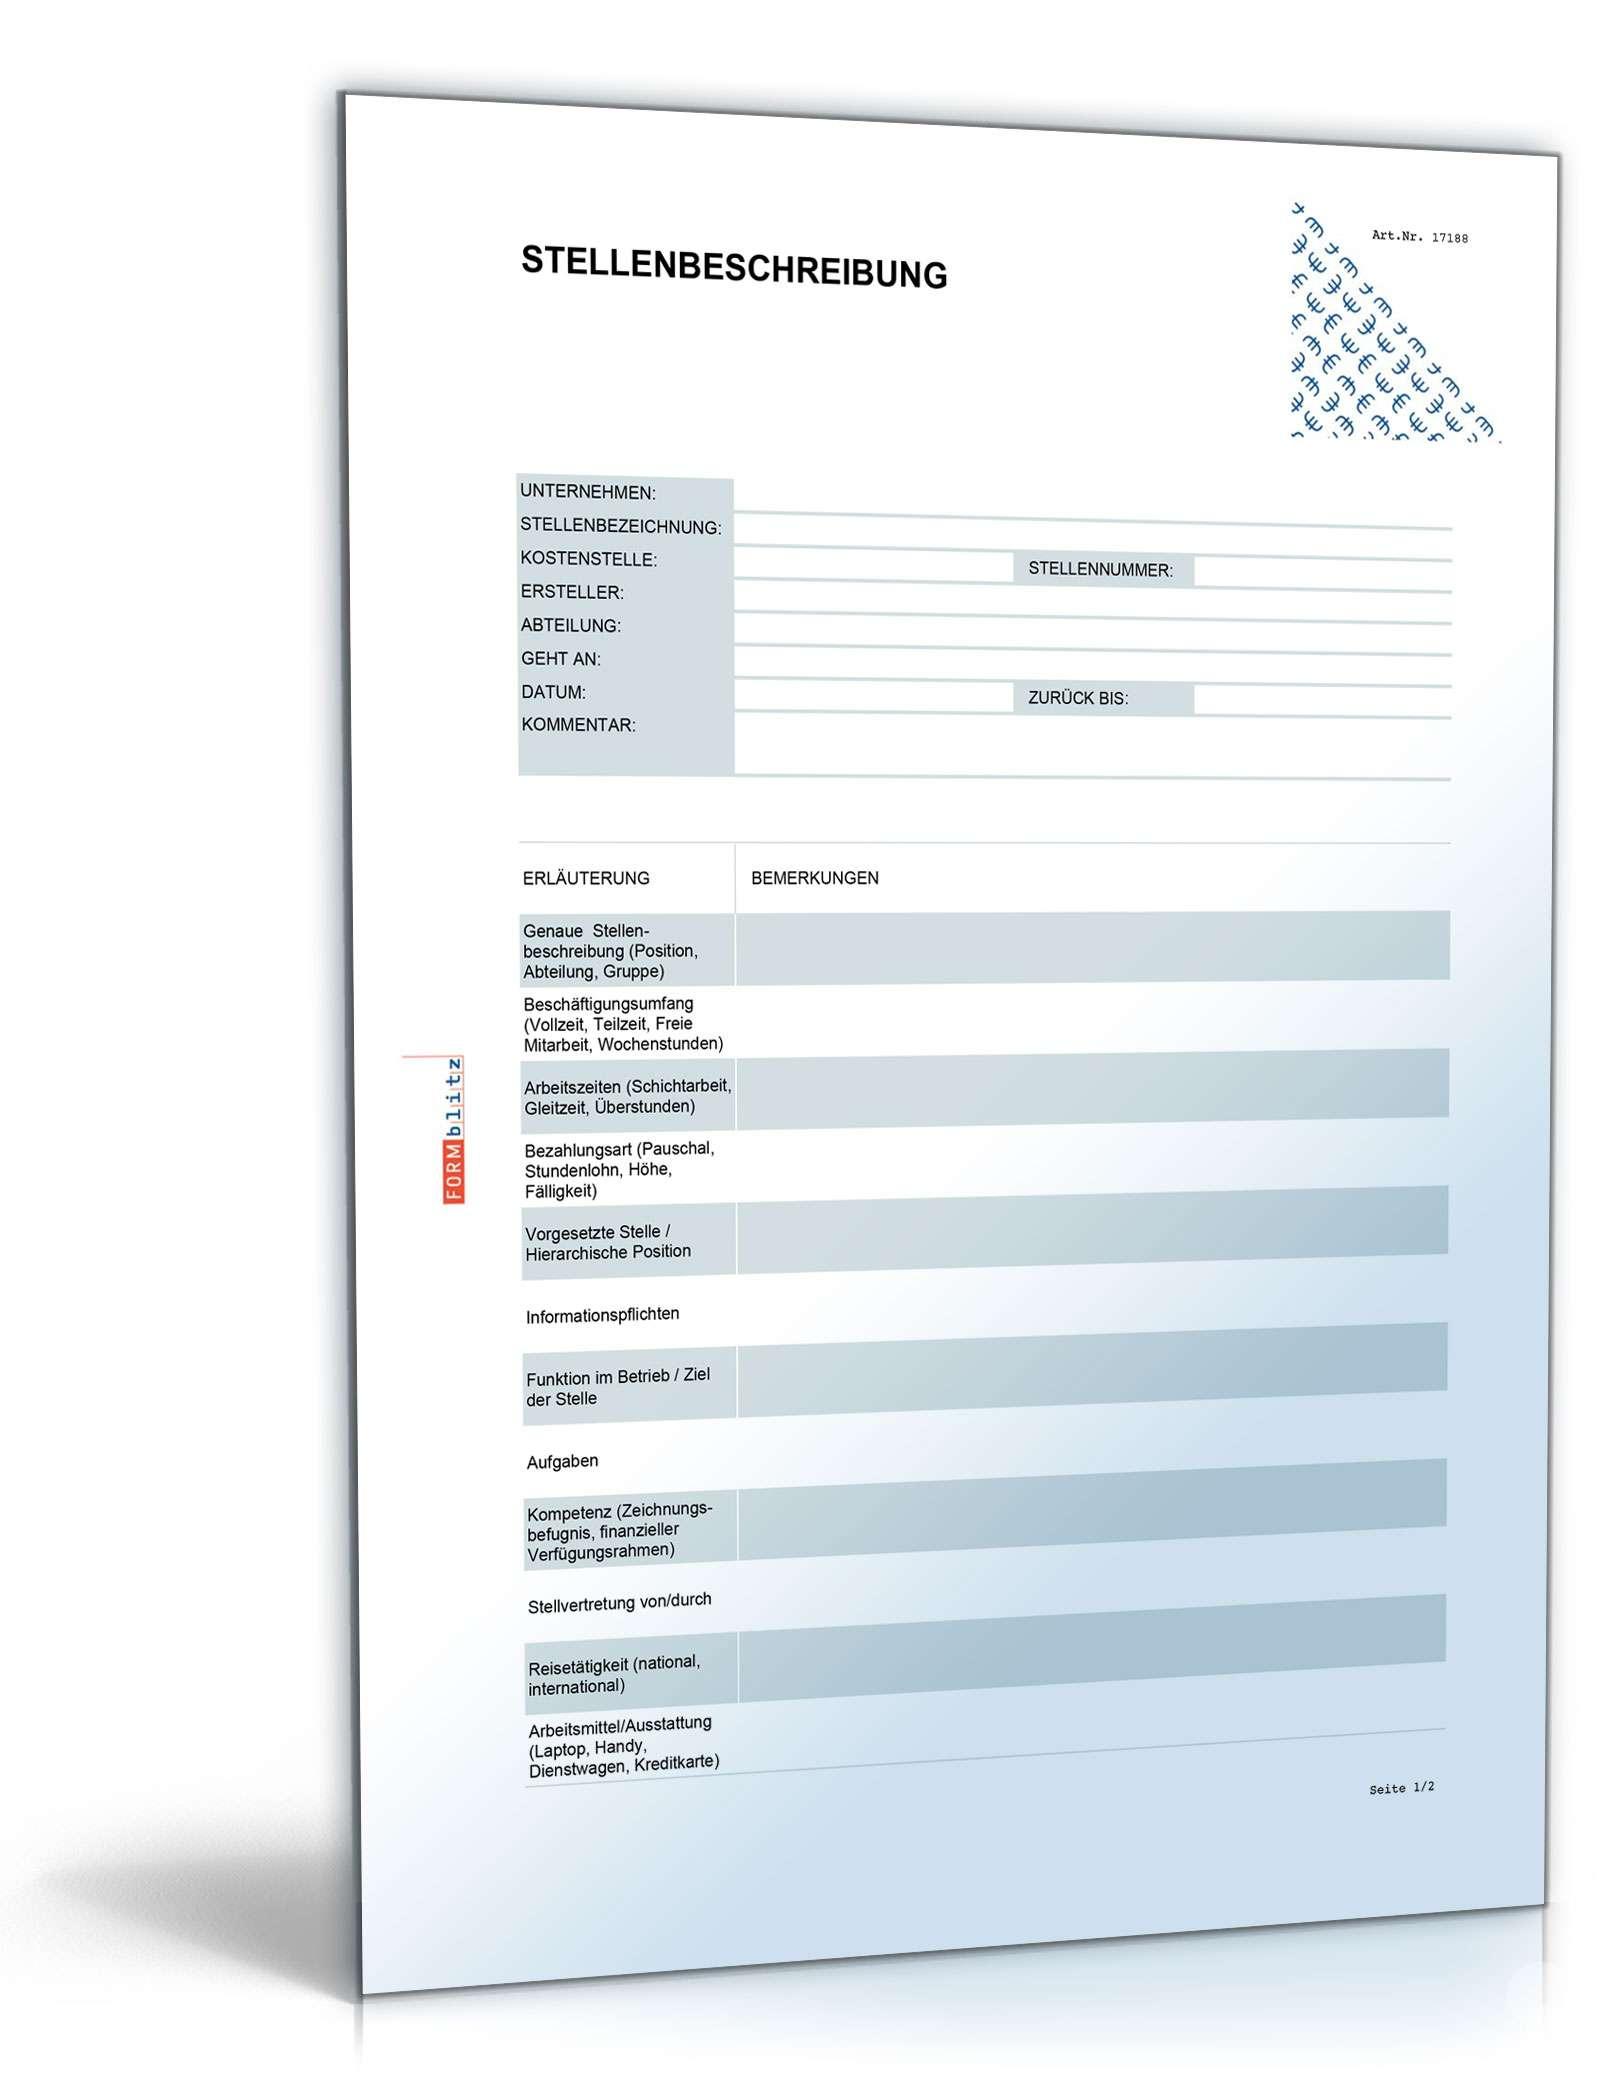 Stellenbeschreibung Geschaftsfuhrer In Muster Zum Download 4